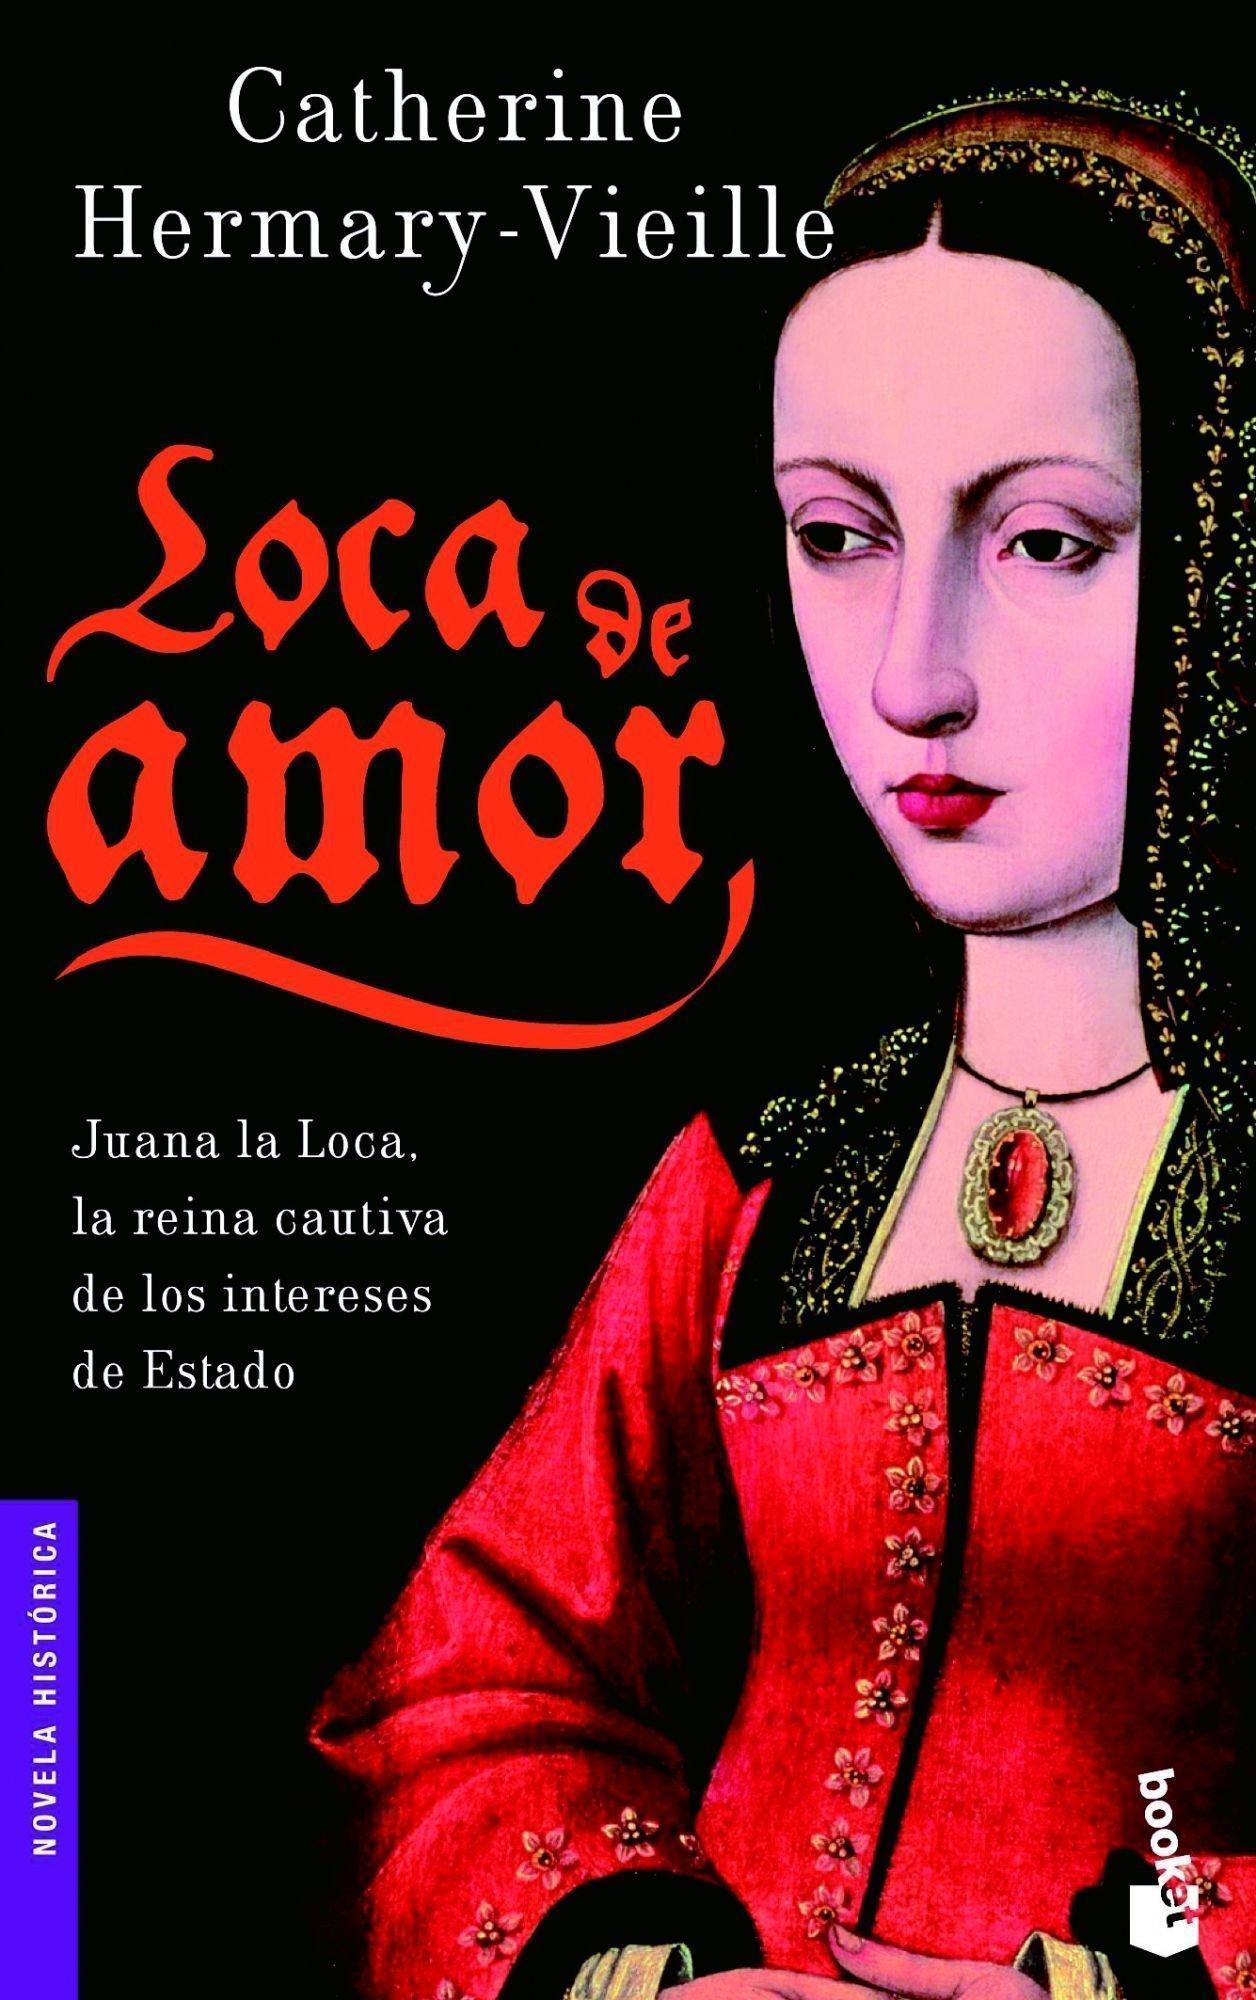 Loca De Amor (Spanish Edition) (Spanish) Paperback – March 1, 2003